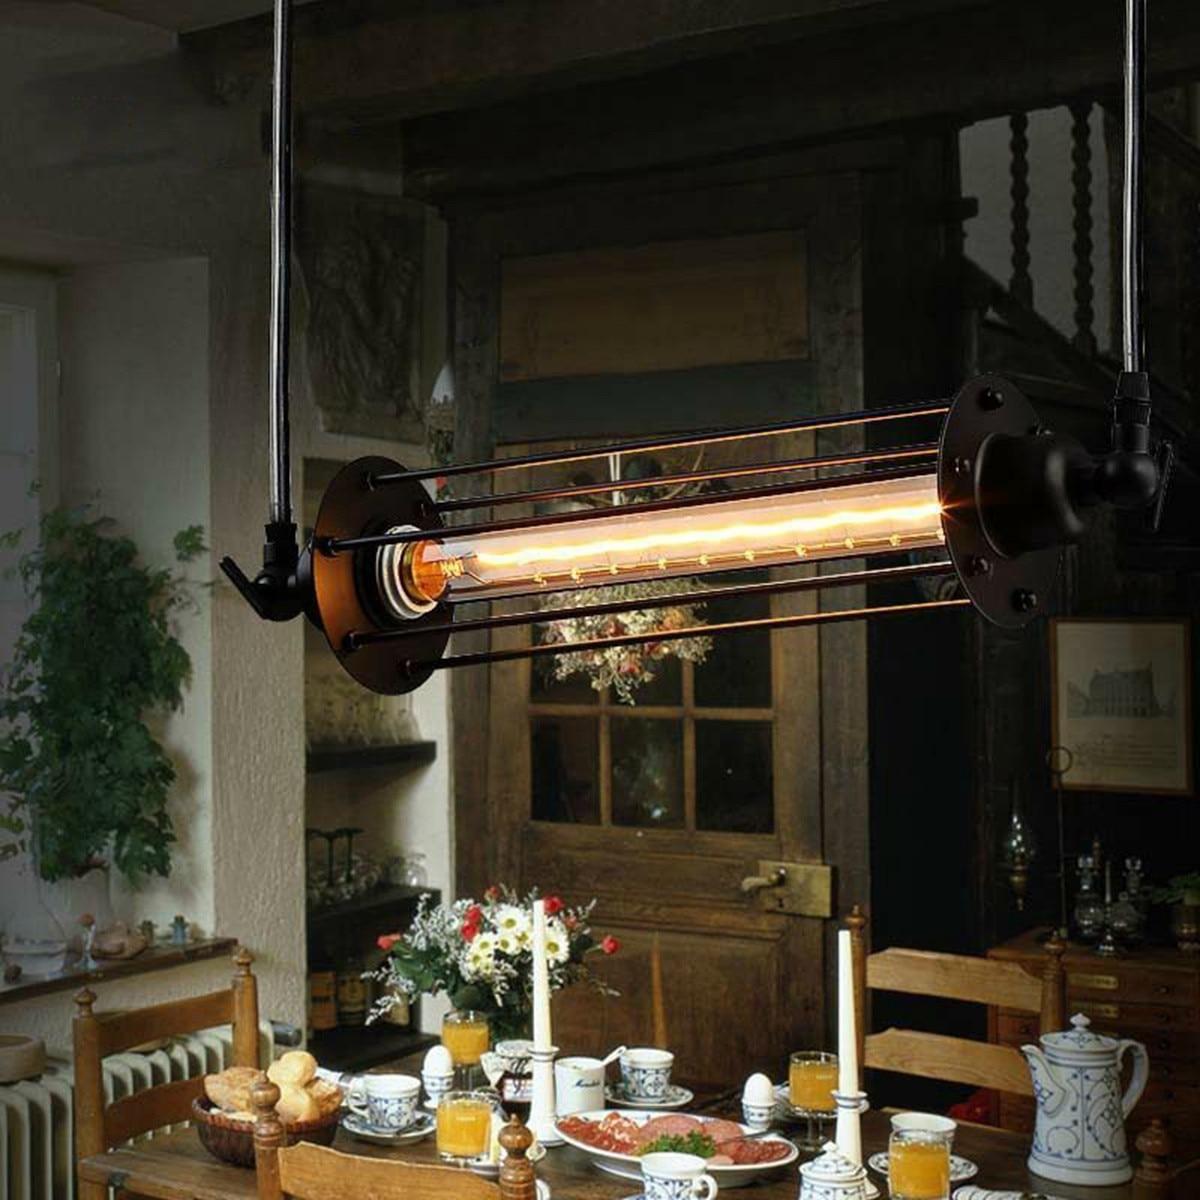 AC 110 240V Retro Vintage Flute Ceiling Lamp E27 Bulb Hanging Pendant Light Cafe Bar Restaurant Indoor Lighting Decor